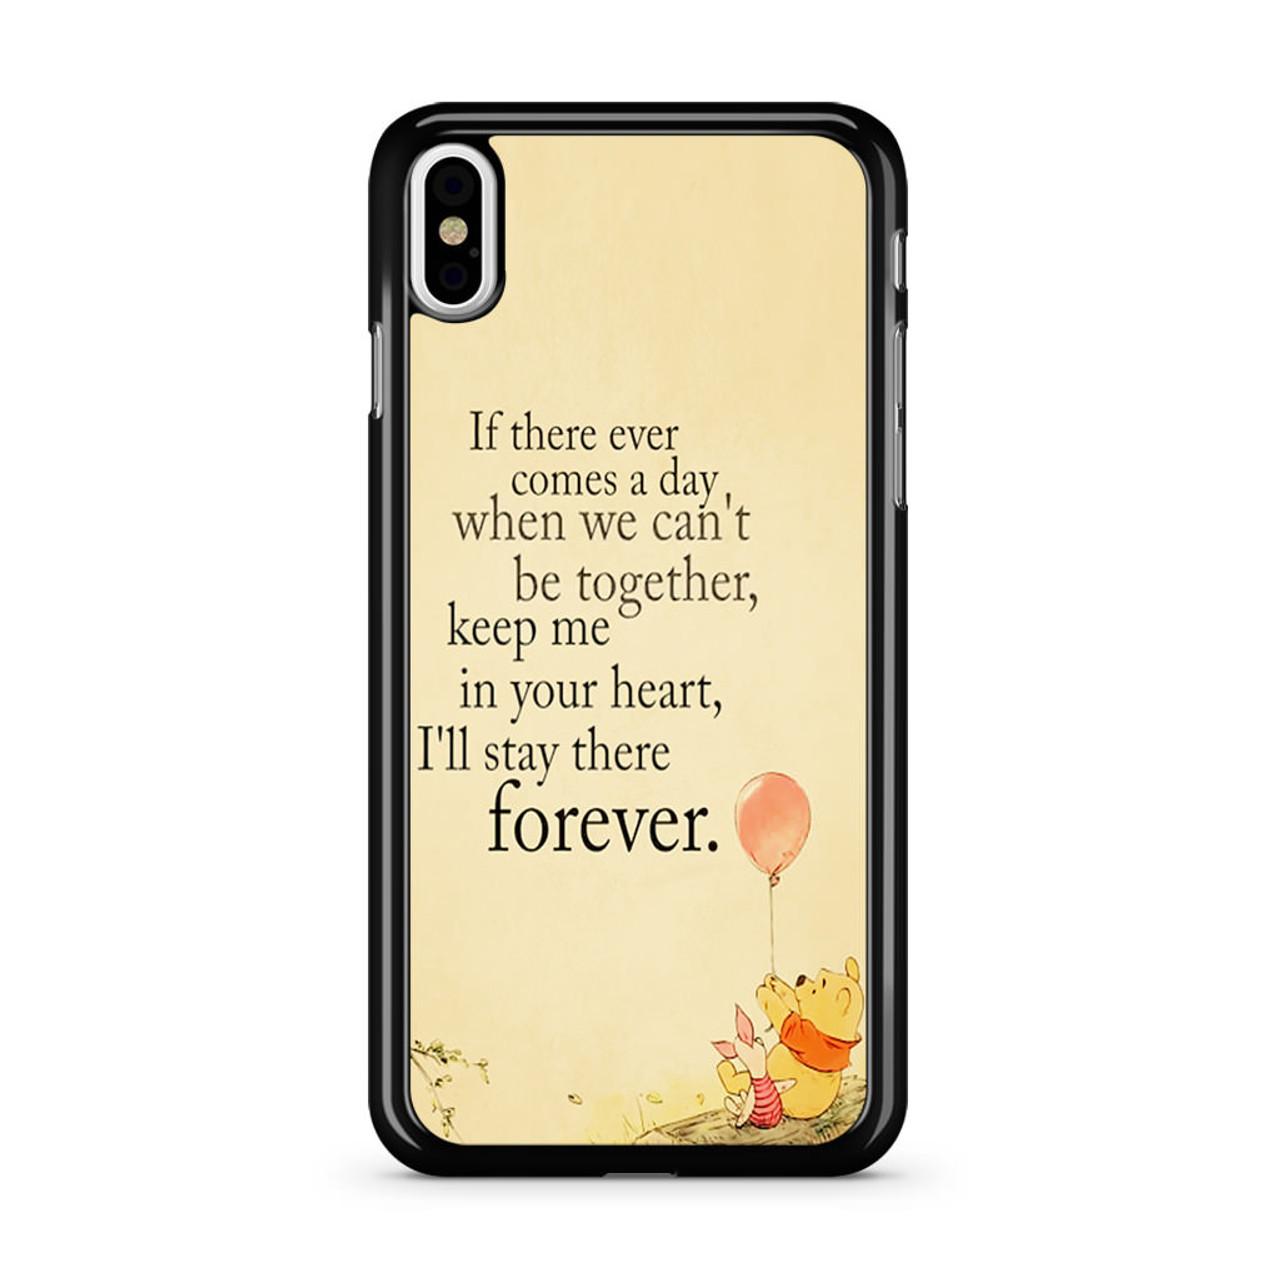 iphone xs quote case